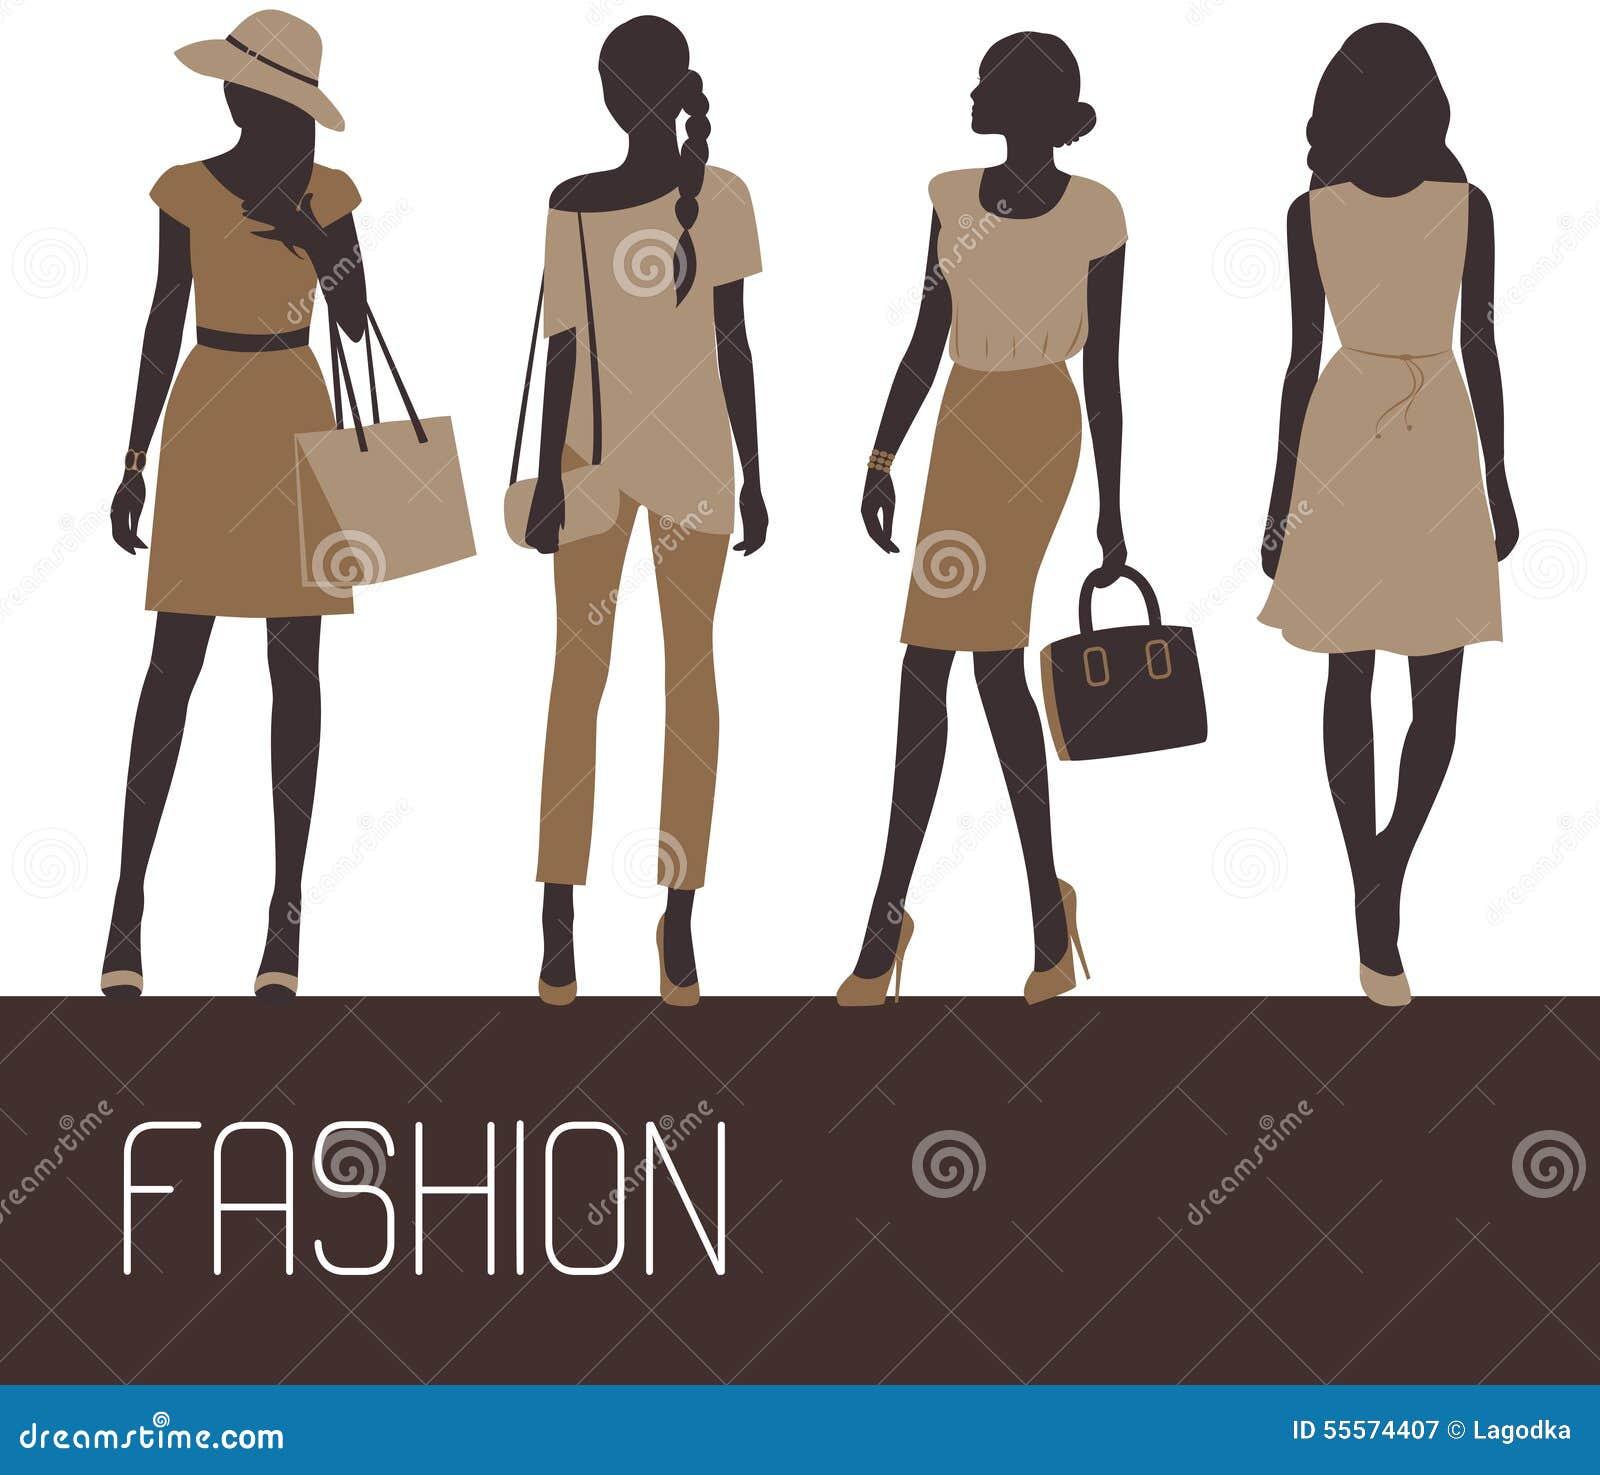 fashion solhouettes